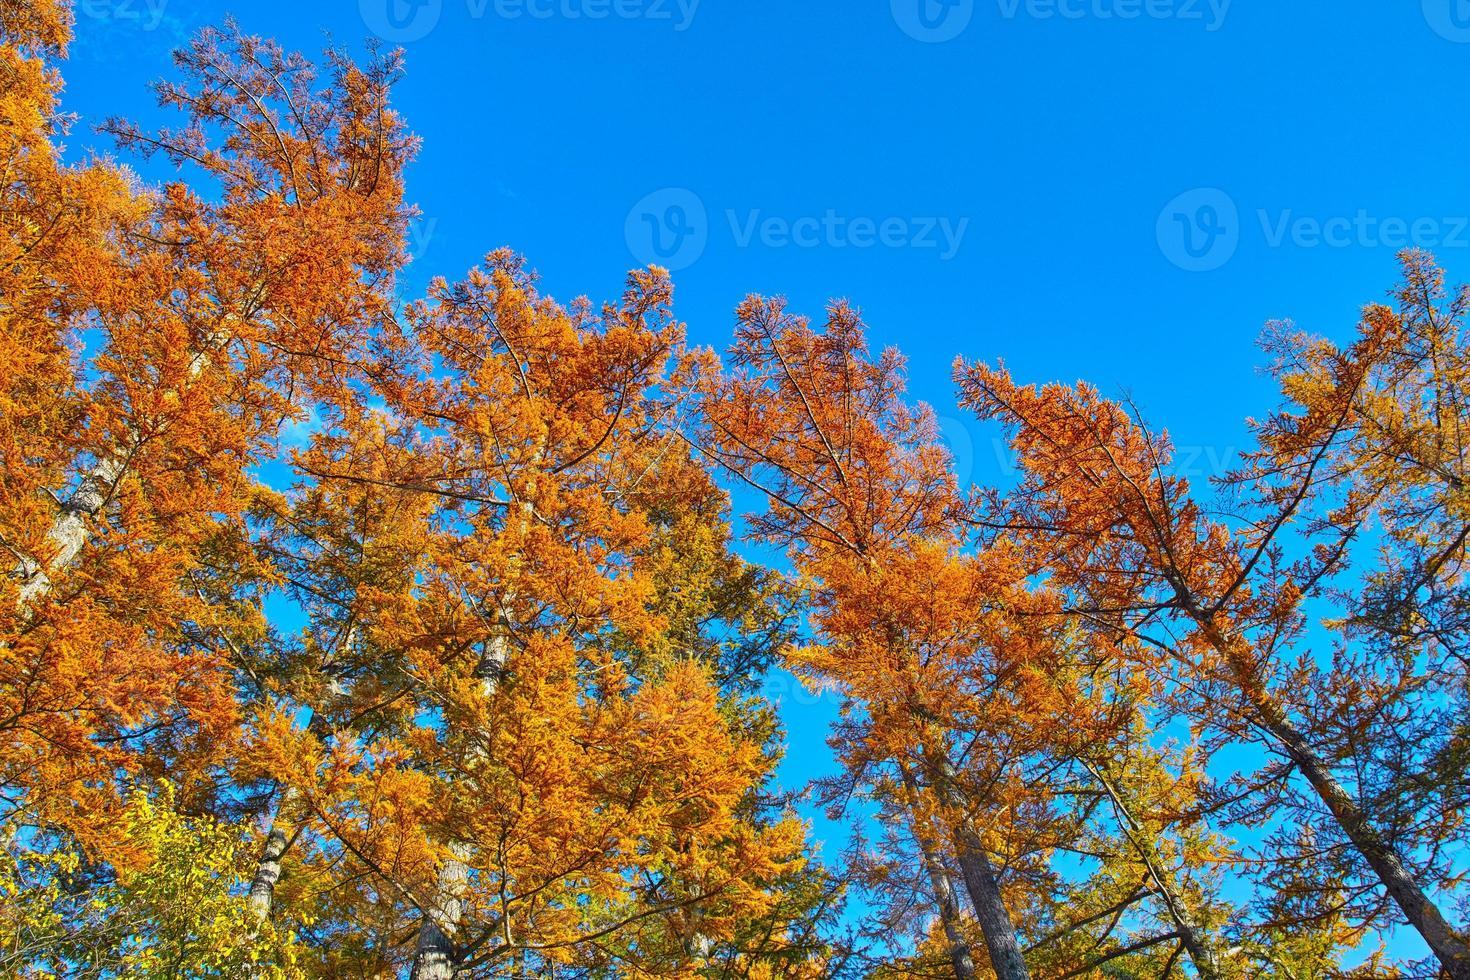 foglie d'autunno i boschi di larici a kamikochi foto